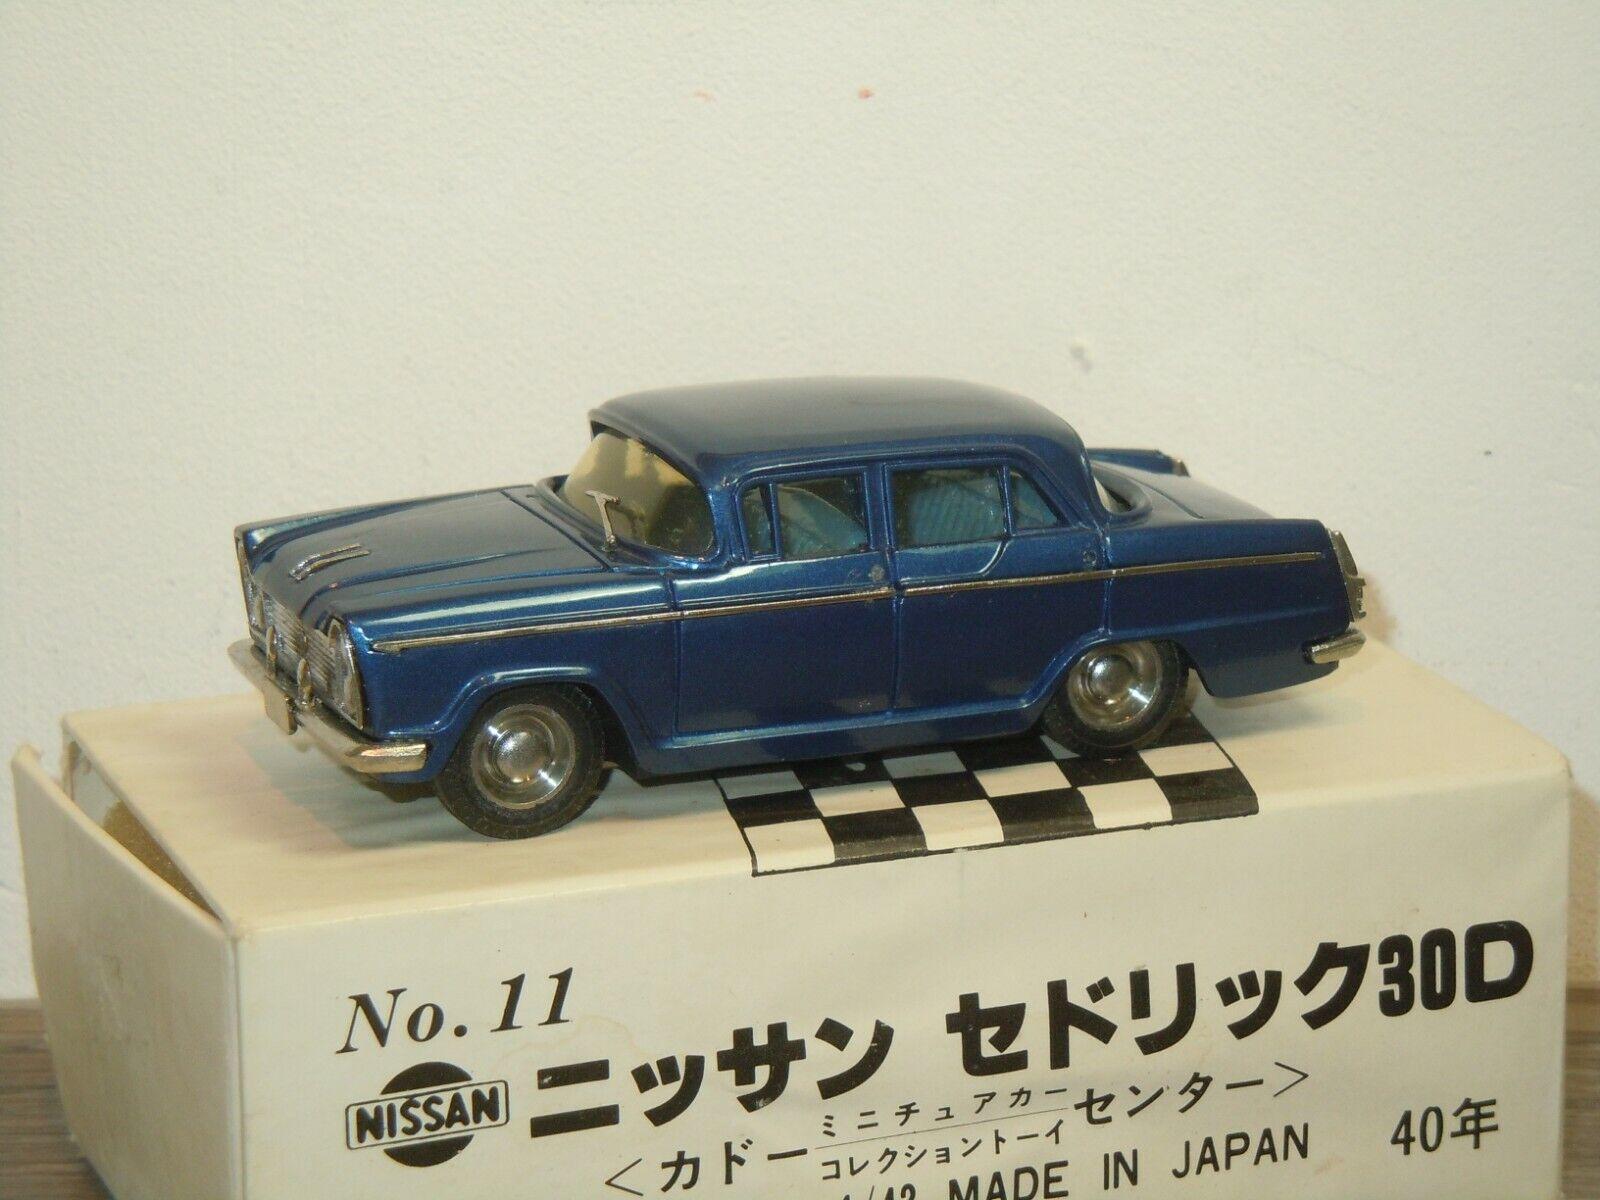 Nissan Cedric 30D 1960 - Kado 11 Japan 1 43 in Box 38295